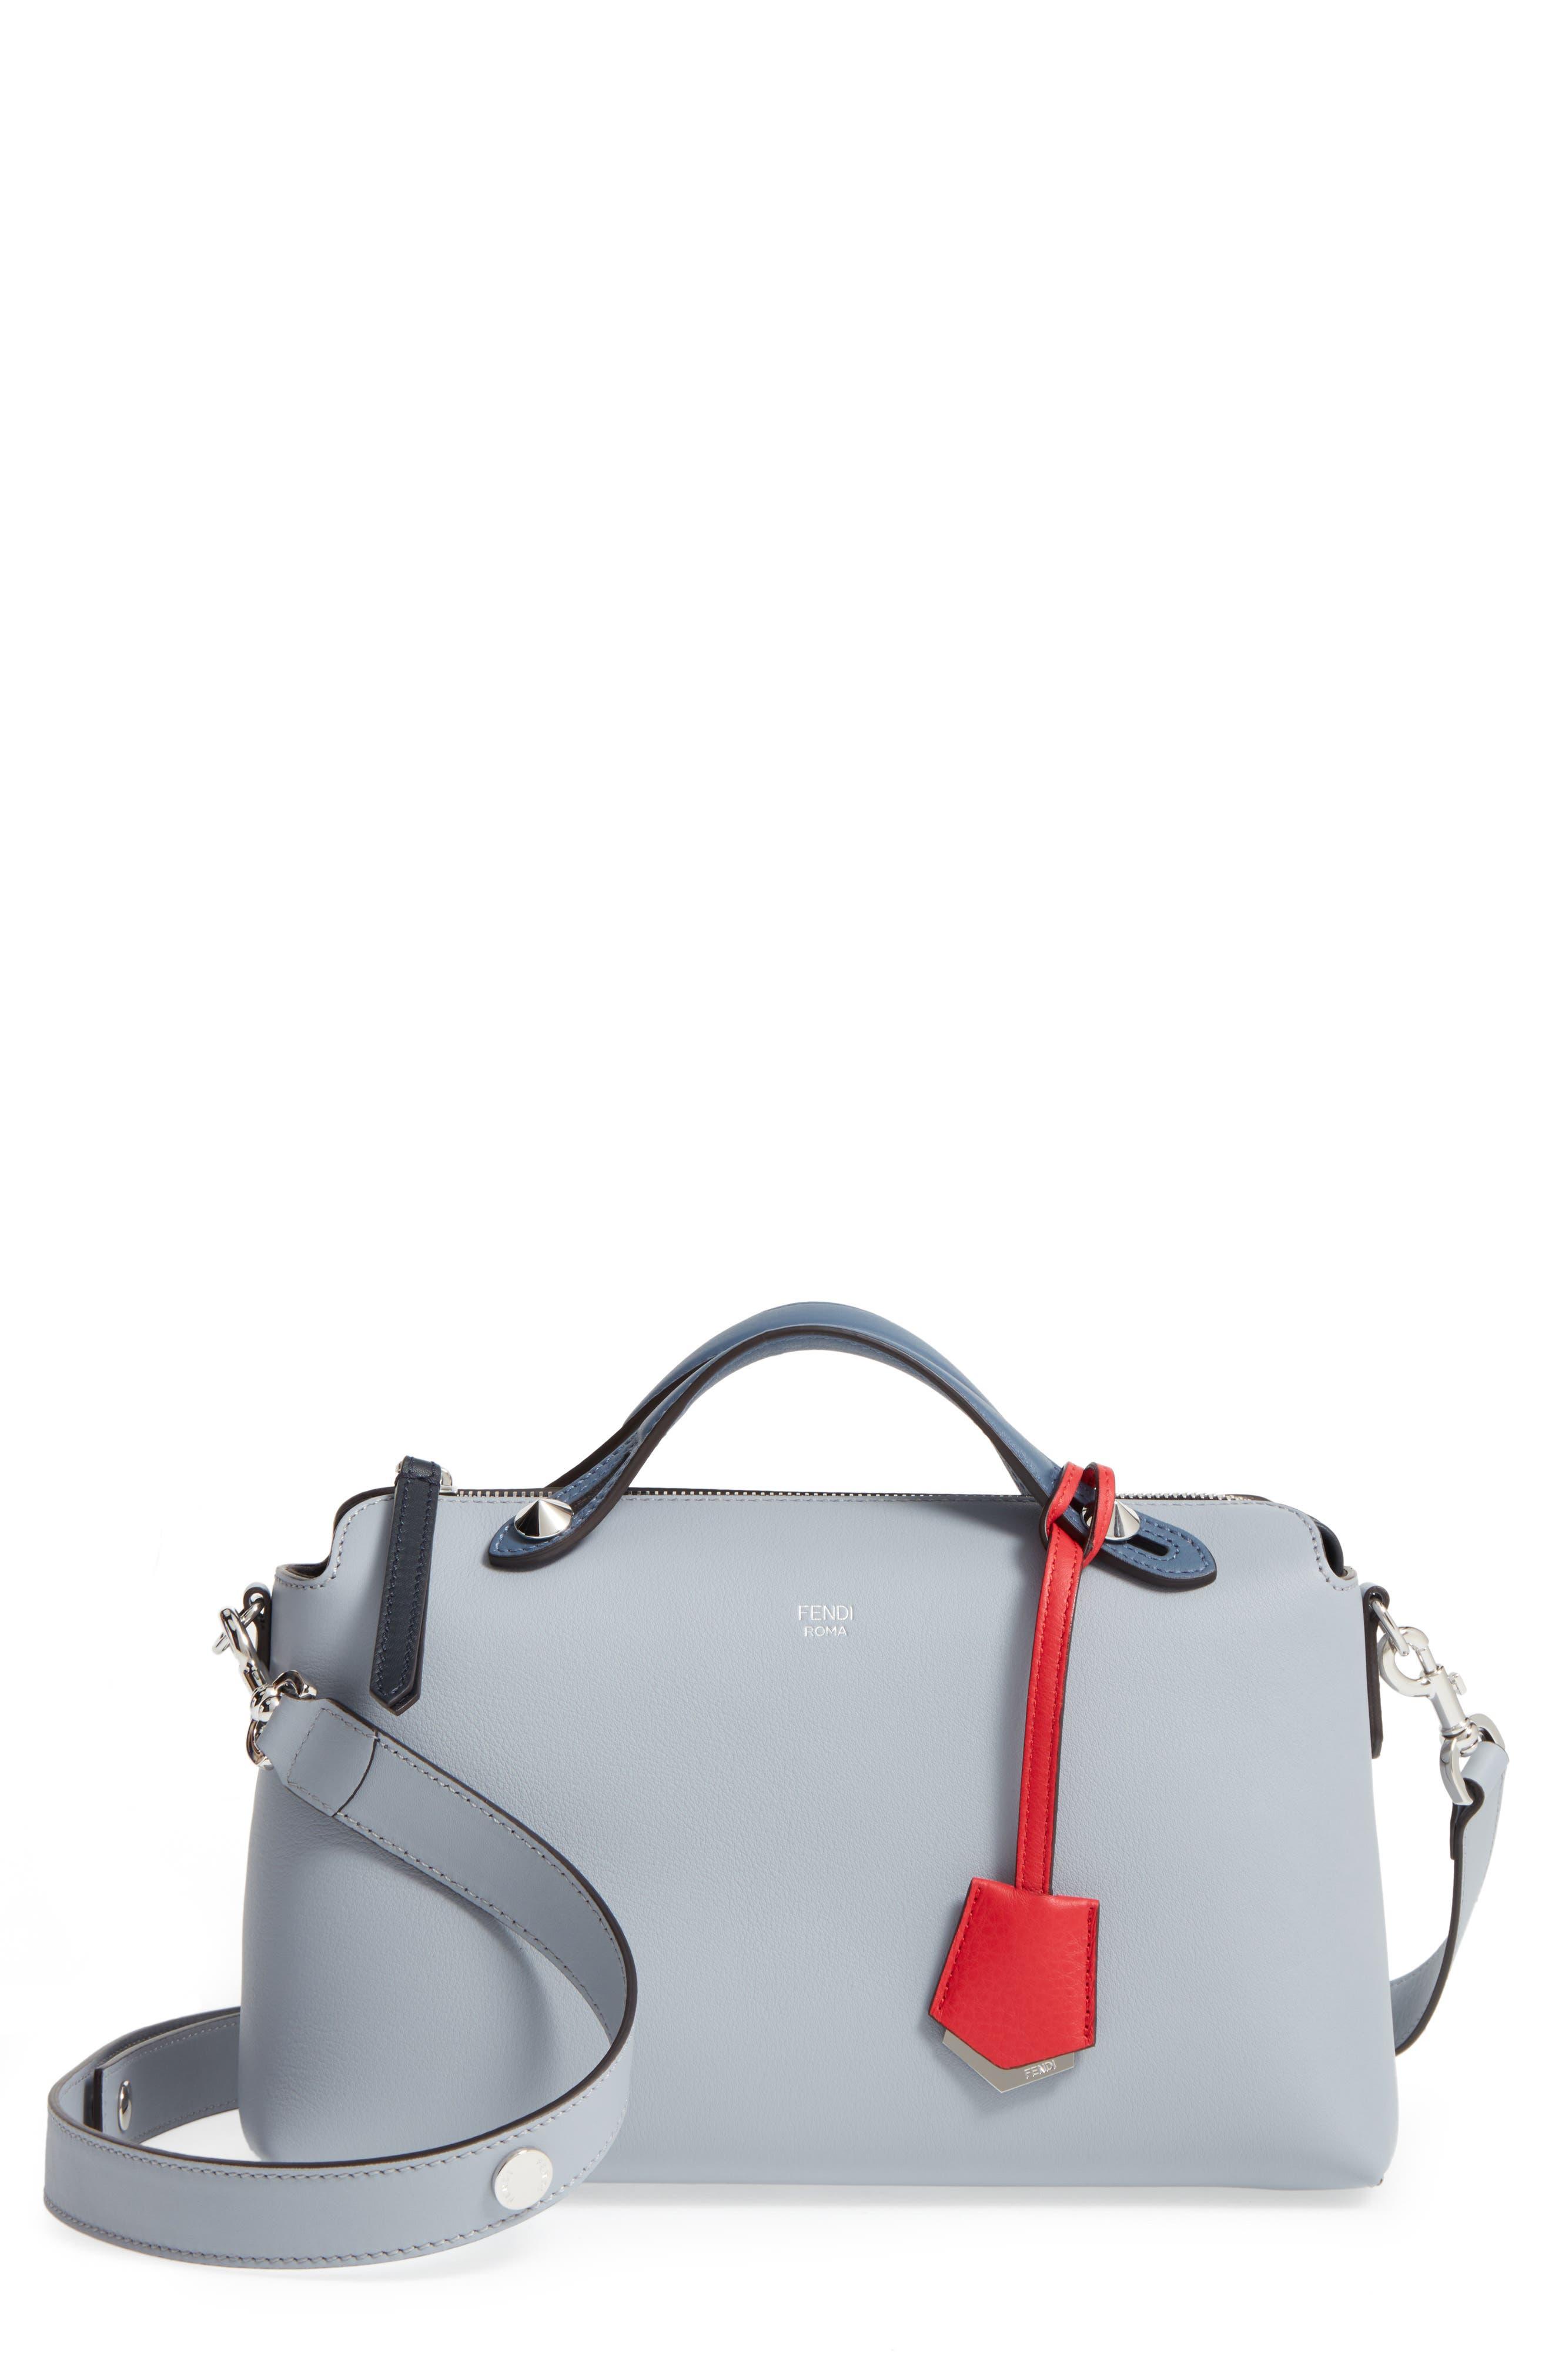 Alternate Image 1 Selected - Fendi 'Medium By the Way' Colorblock Leather Shoulder Bag